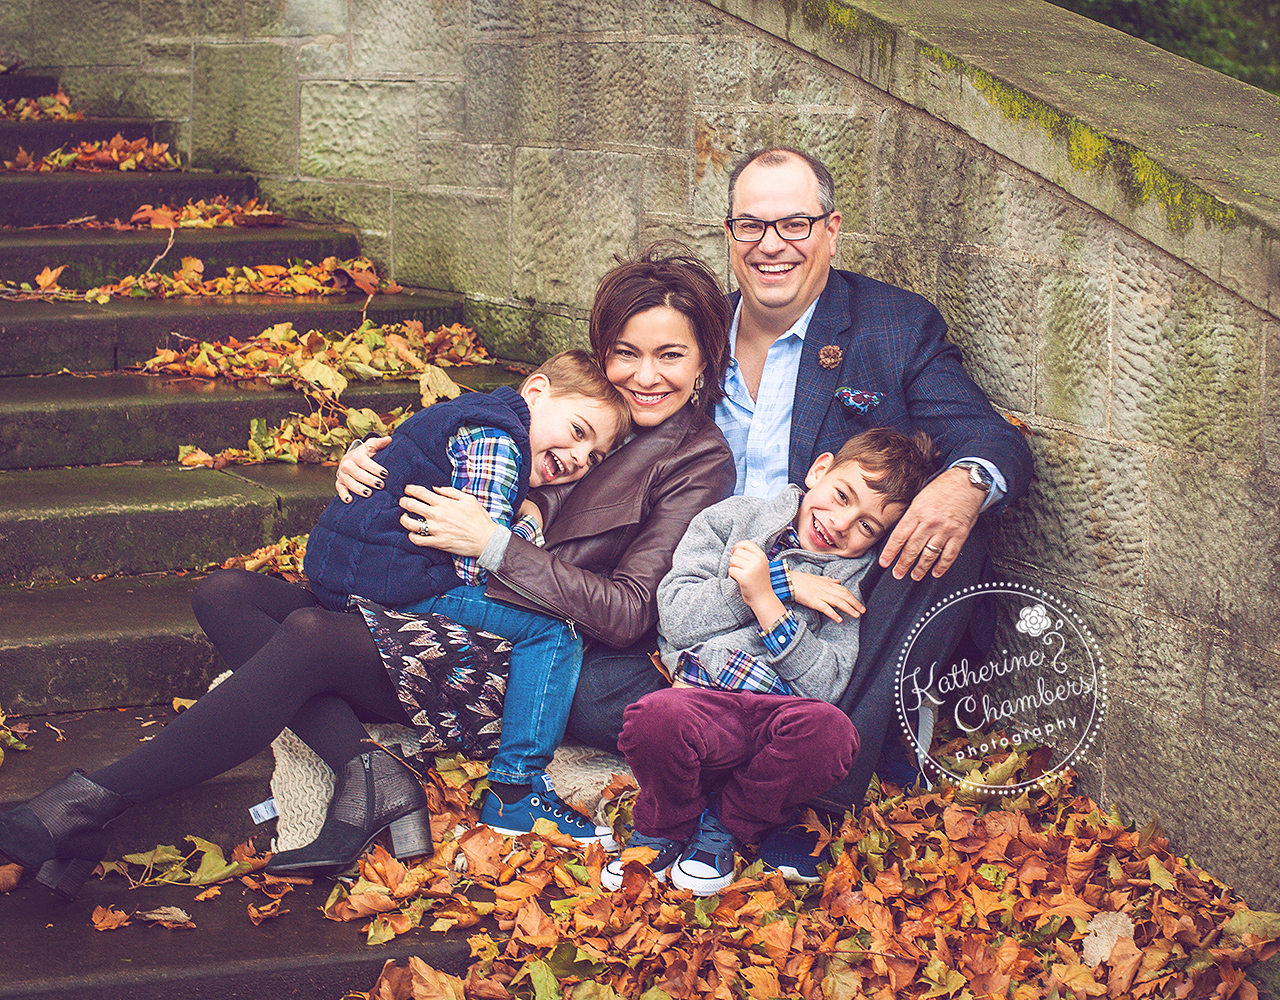 Cleveland Cultural Gardens, Fall Family Photos, Fun Family Photos, Cleveland Family Photography